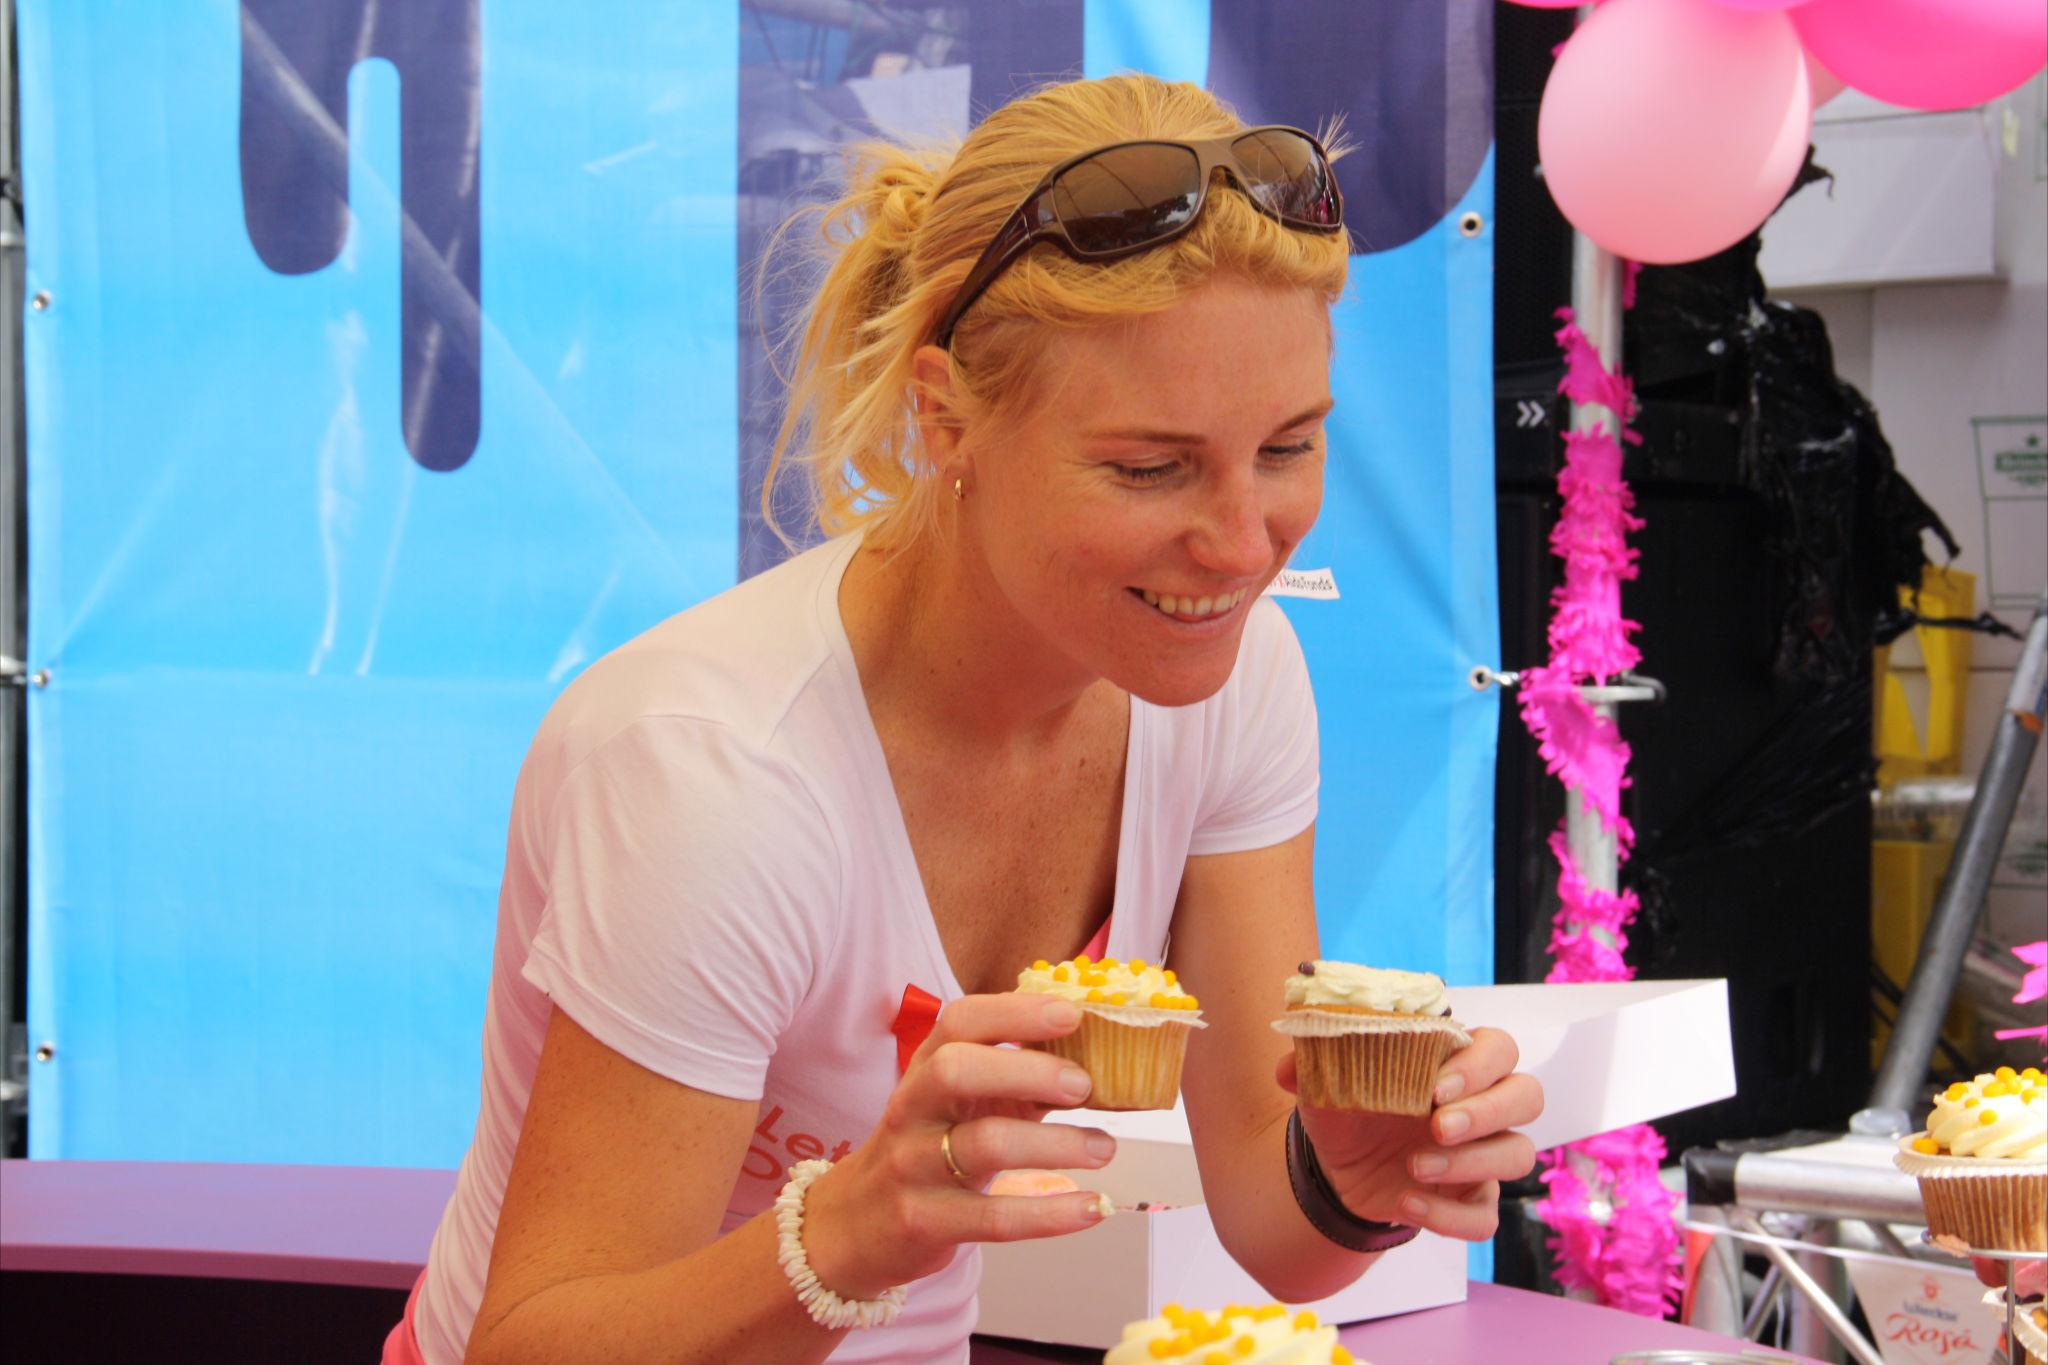 Cupcake carousel foto 6